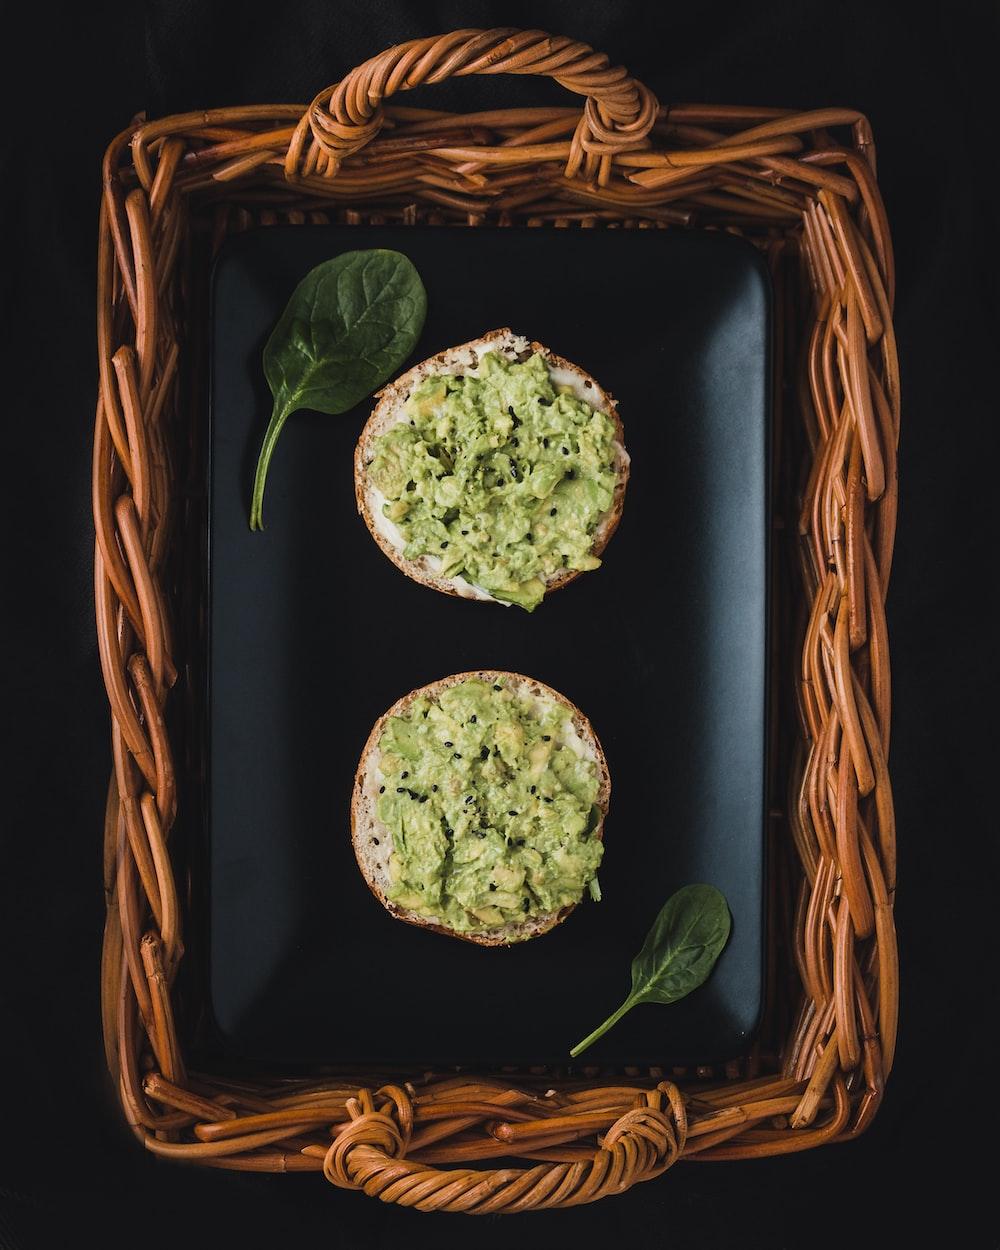 two baked cookies on brown wicker basket